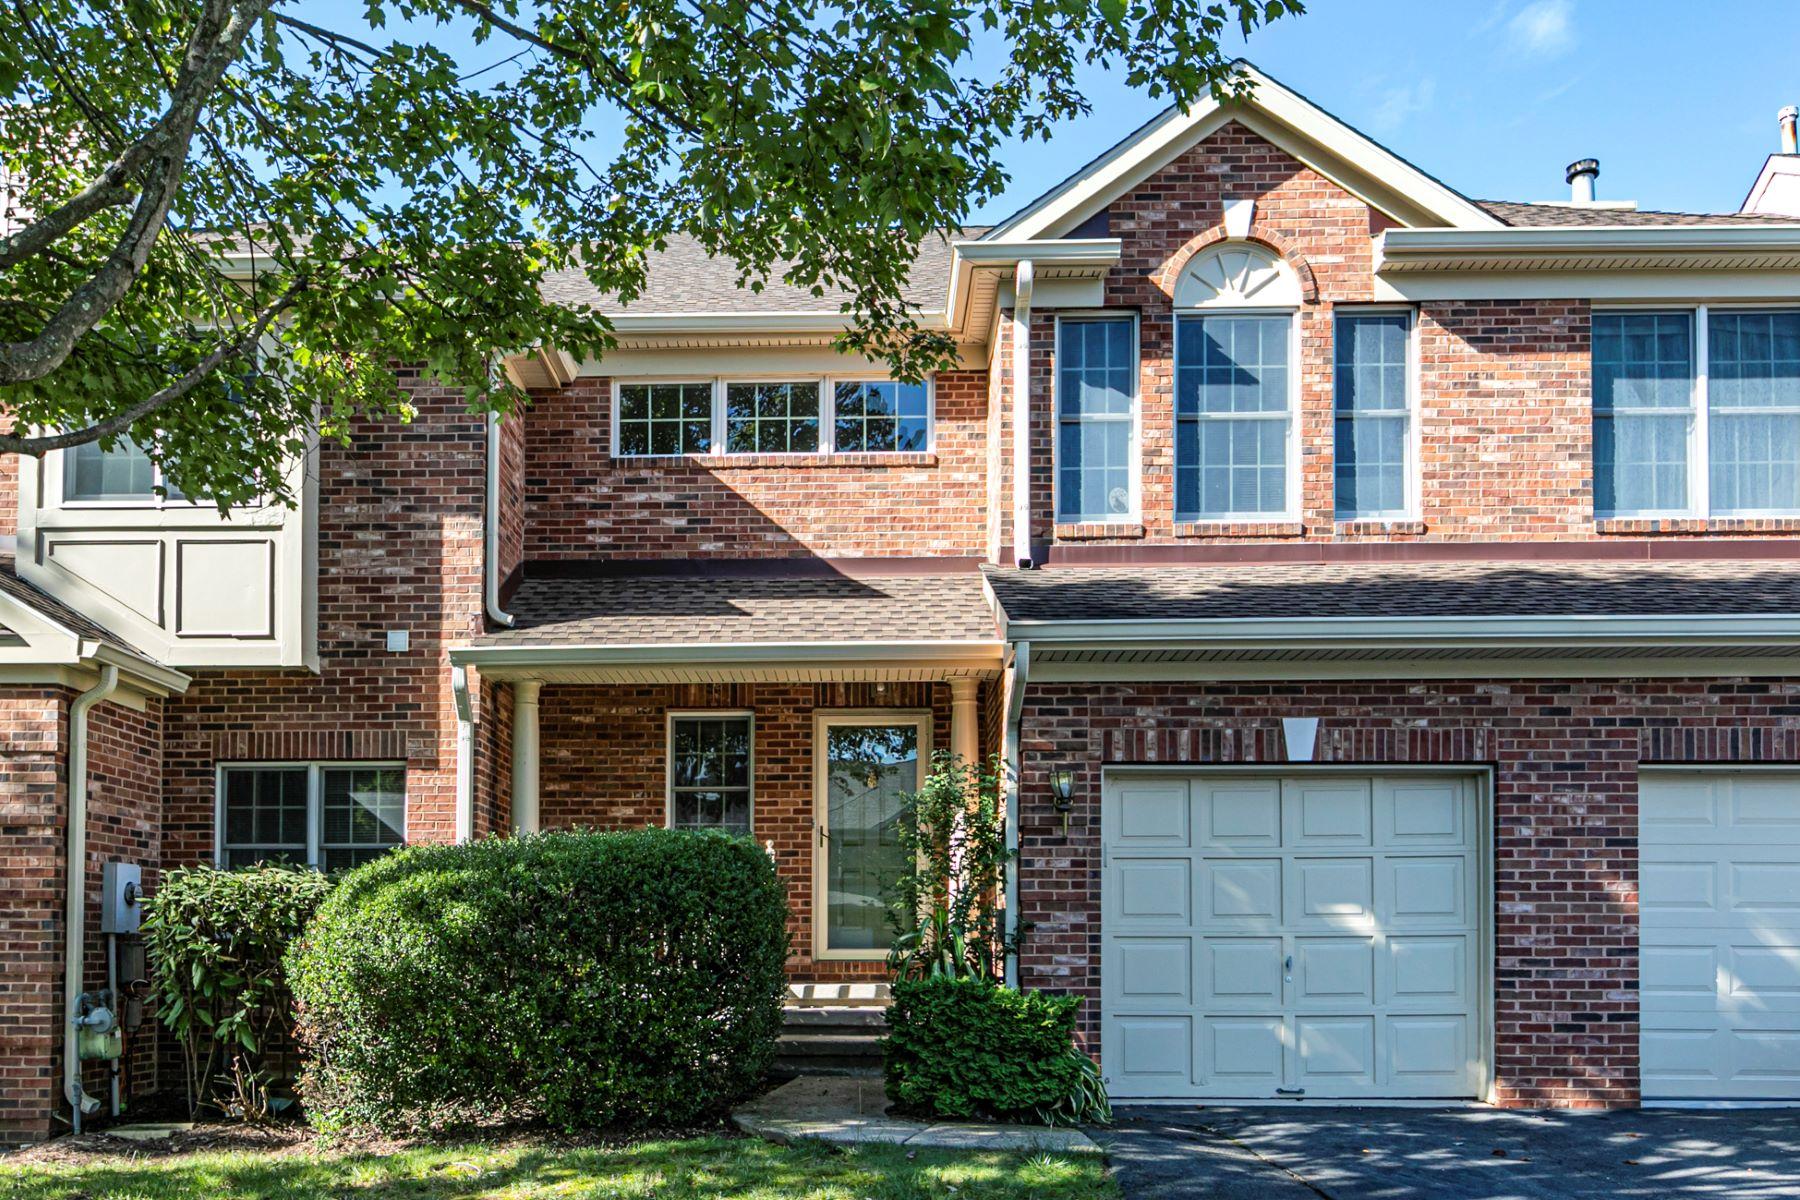 townhouses για την Πώληση στο Washington Oaks Townhome Awash in Natural Light 232 Bullock Drive, Princeton, Νιου Τζερσεϋ 08540 Ηνωμένες Πολιτείες